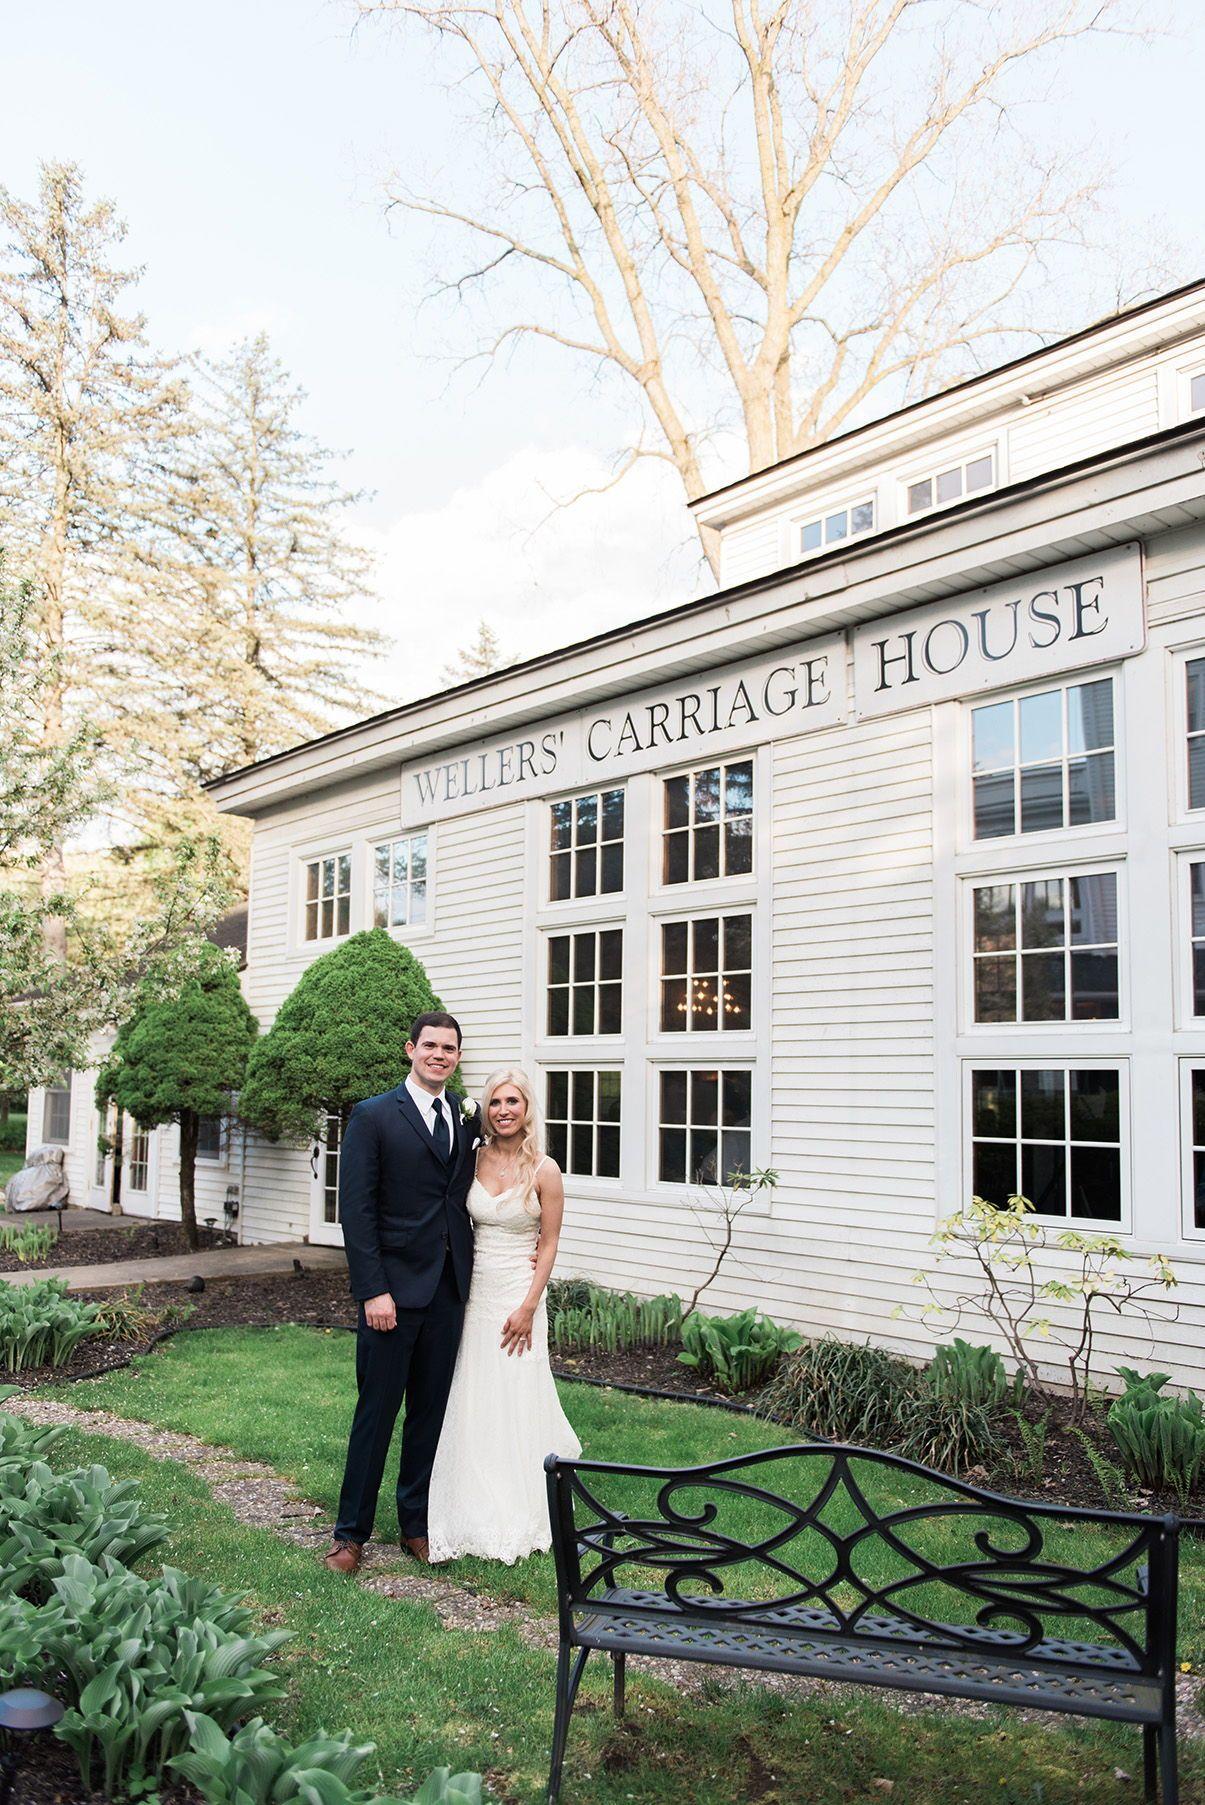 Wellers Carriage House Wedding Photos Saline Michigan Michigan Wedding Venues Outdoor Wedding Ceremony Massachusetts Wedding Venues